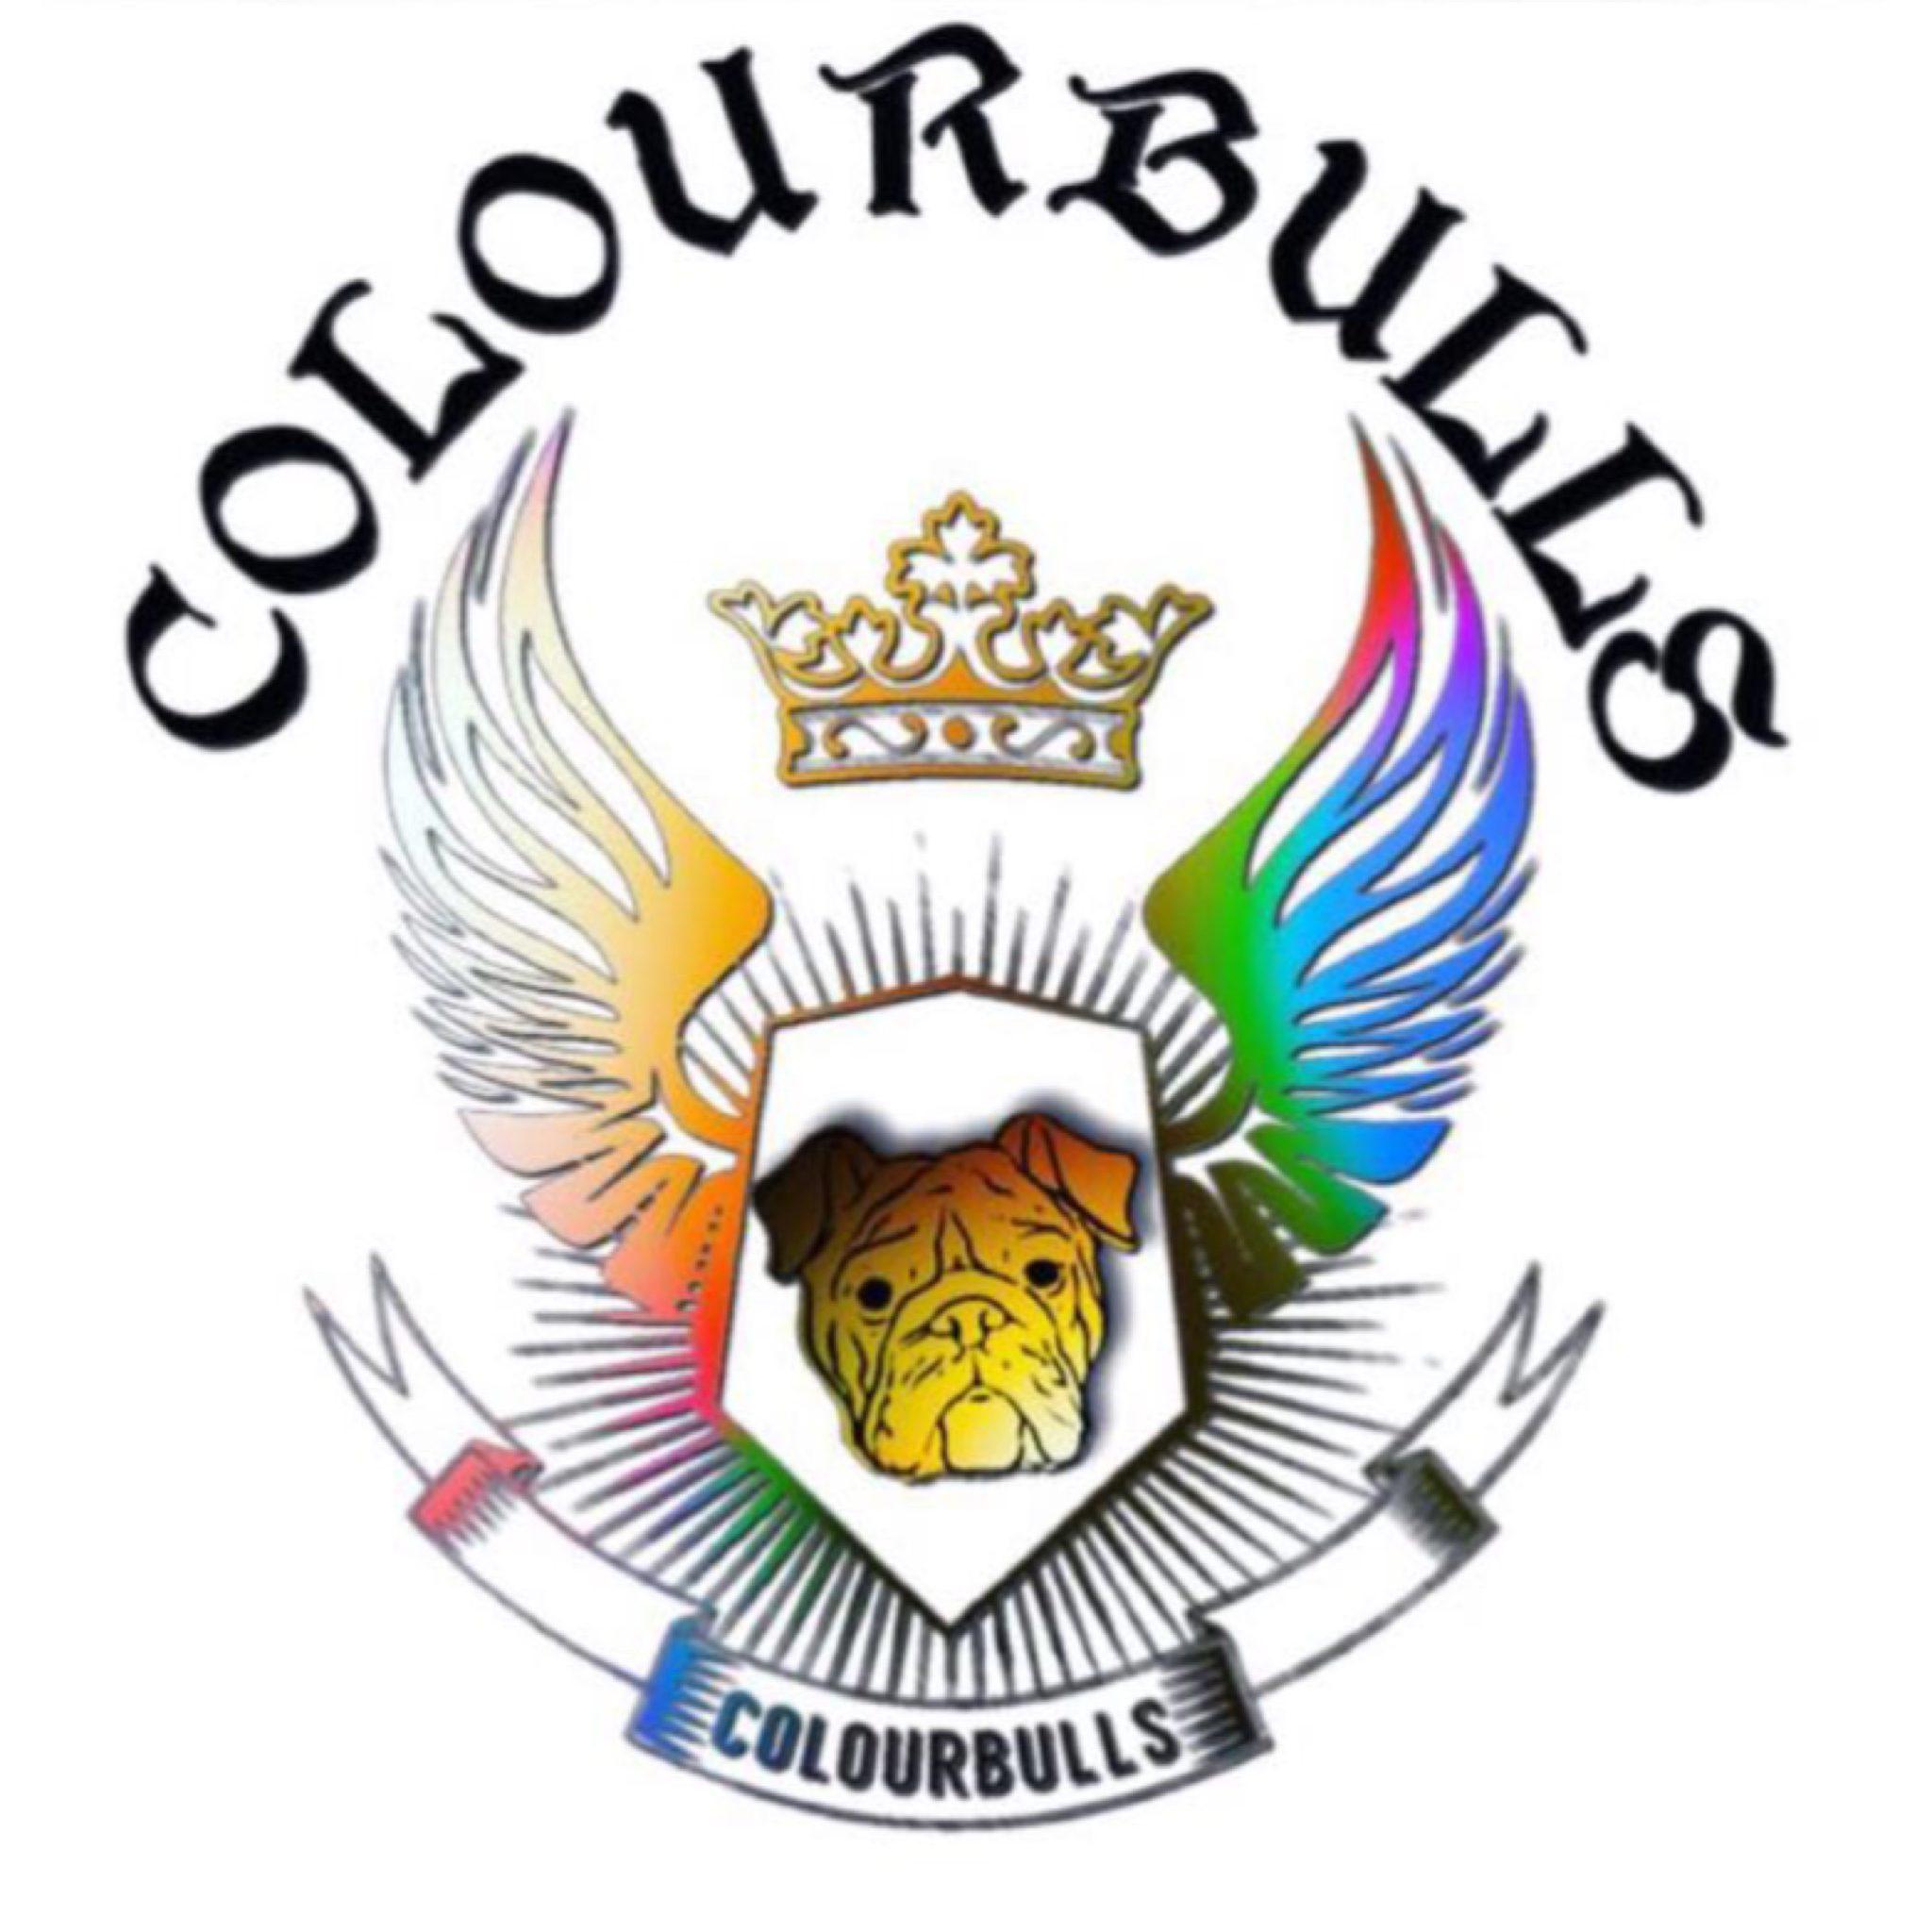 Colourbulls